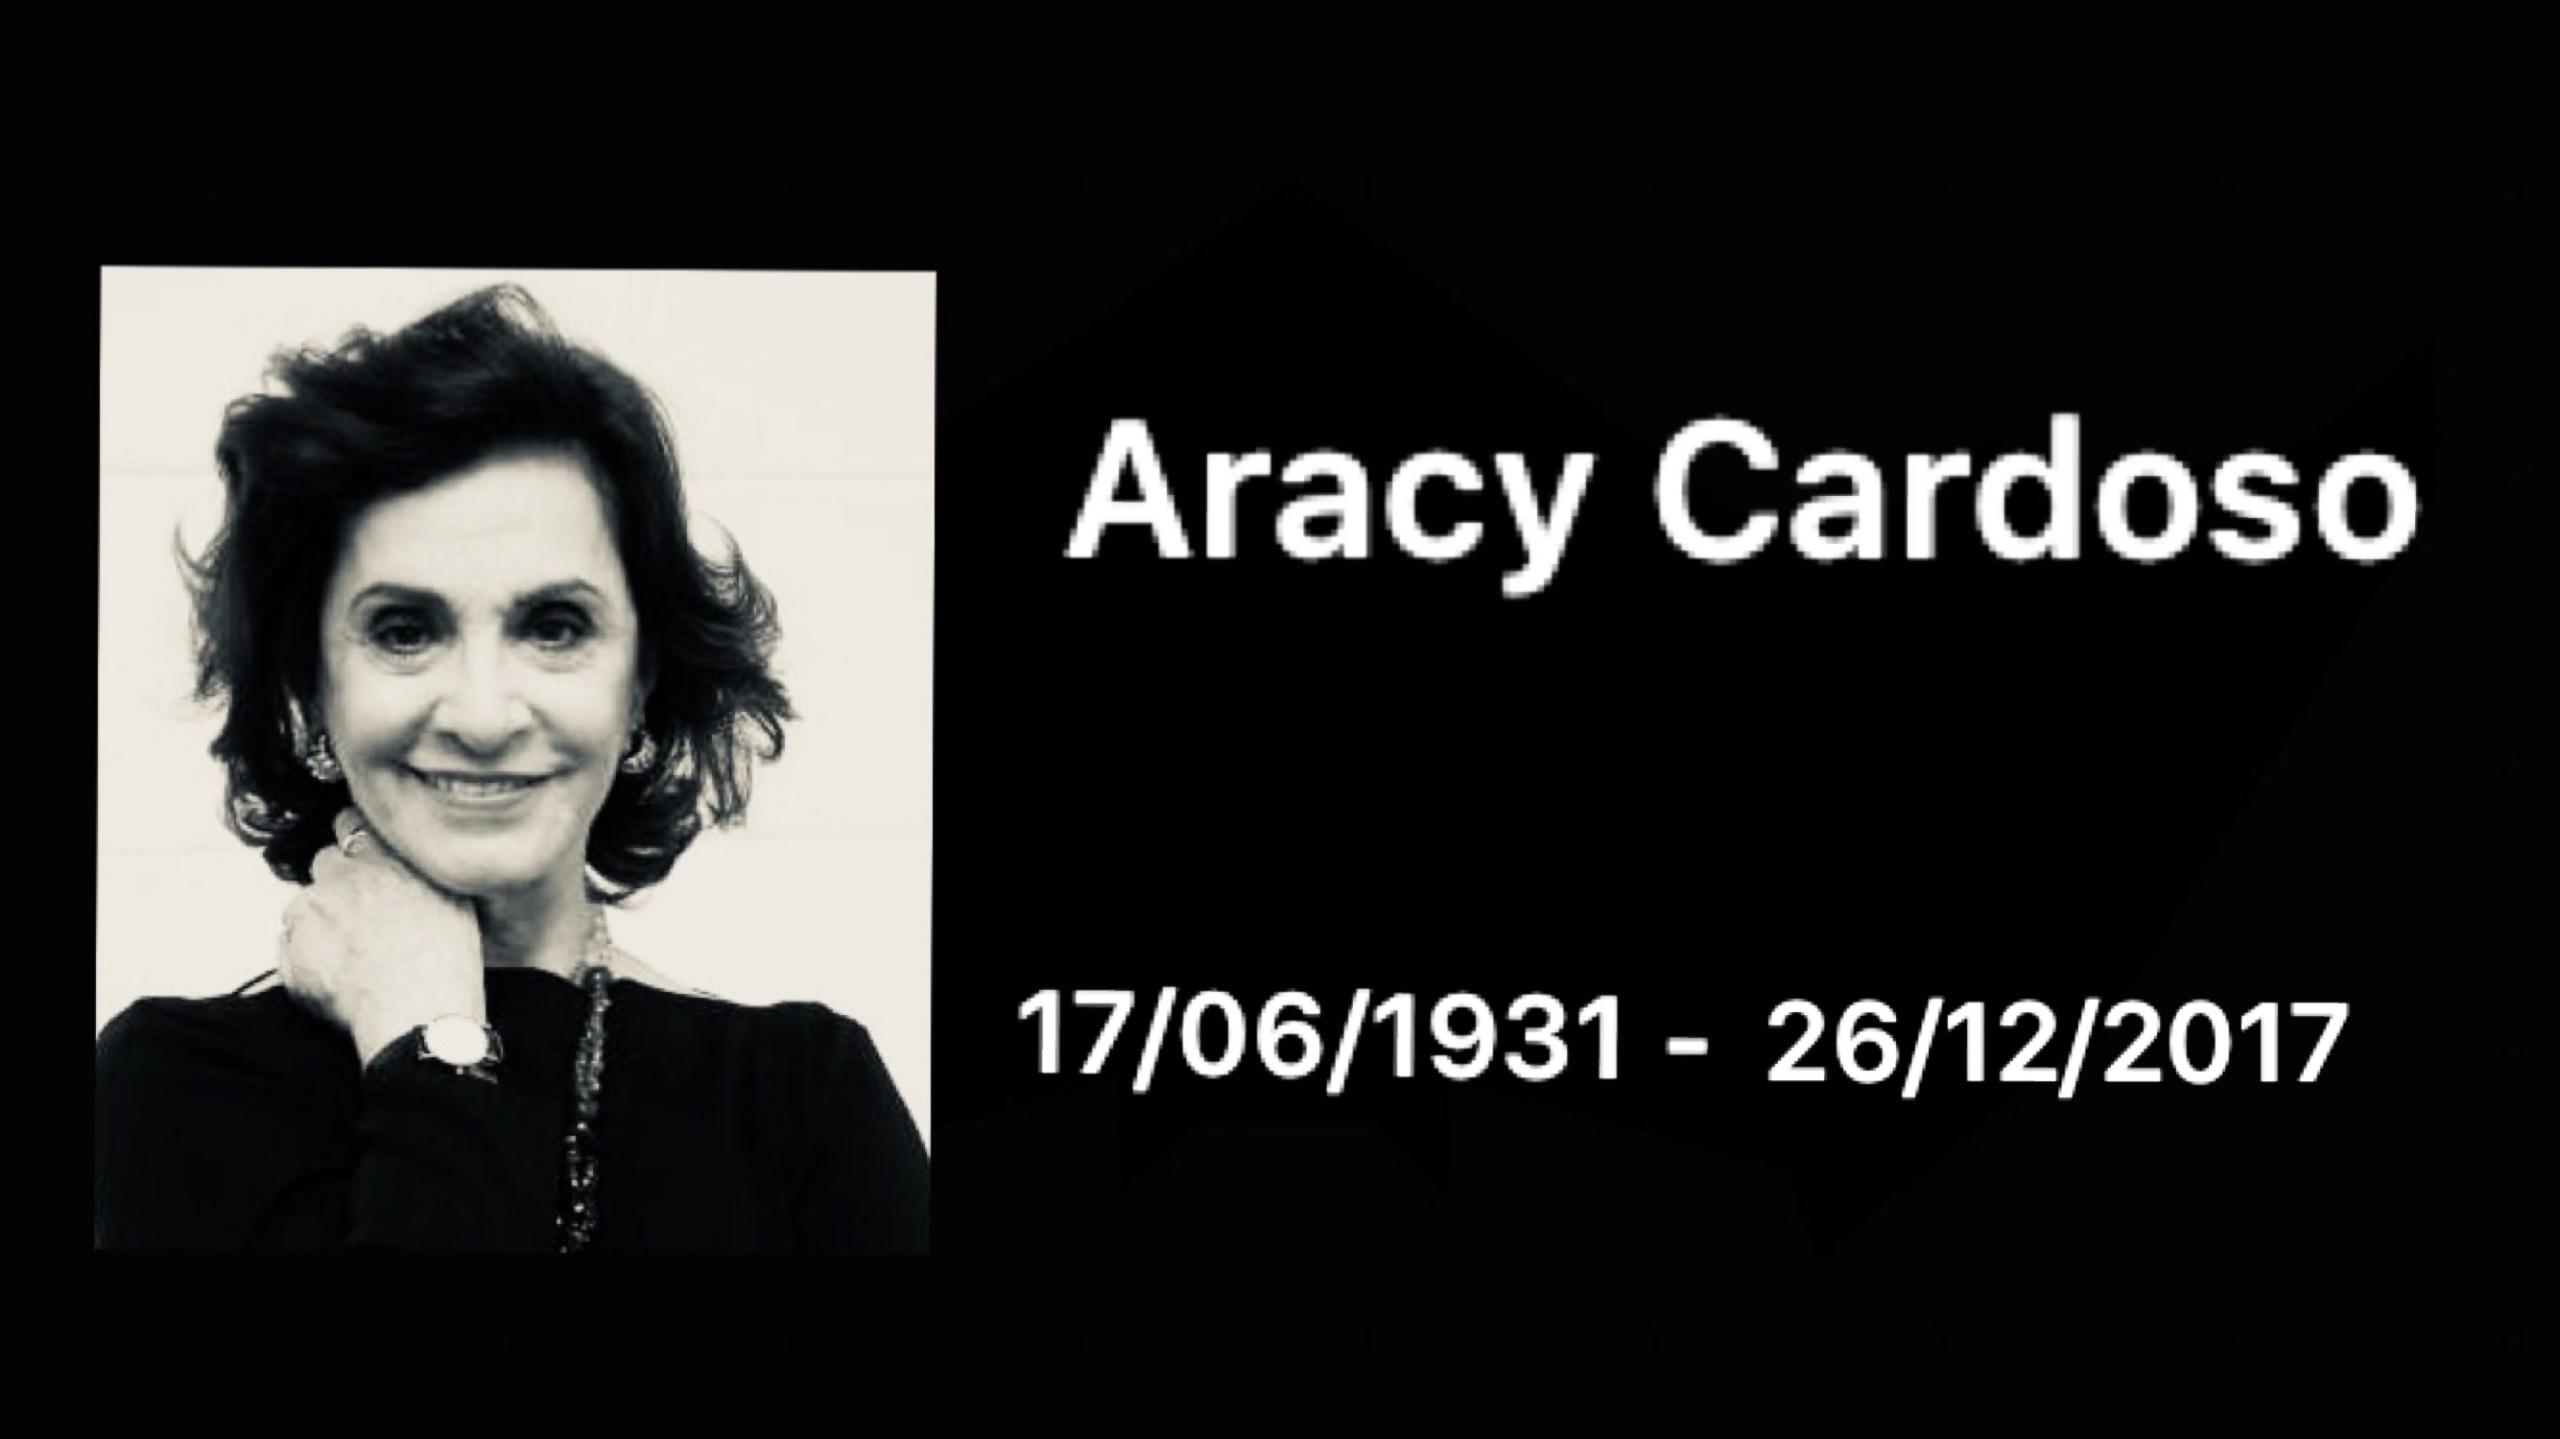 Morre a atriz Aracy Cardoso aos 80 anos 3